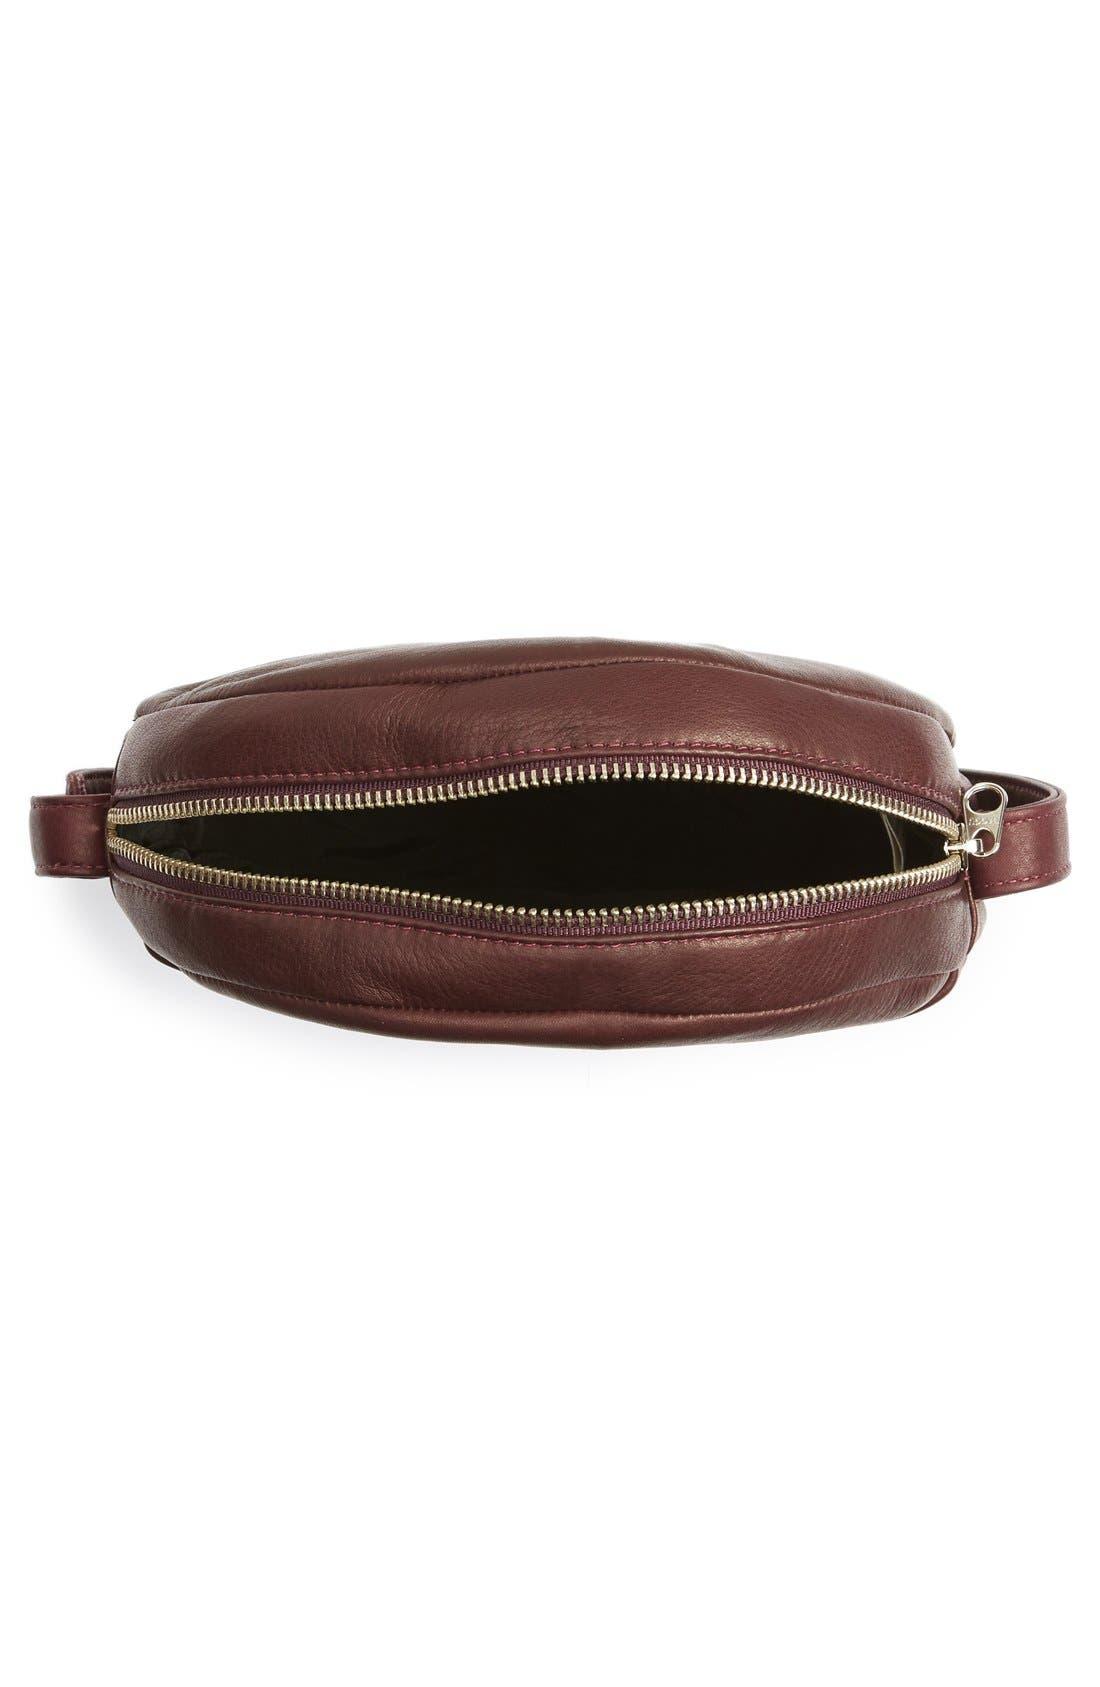 Pebbled Leather Crossbody Bag,                             Alternate thumbnail 18, color,